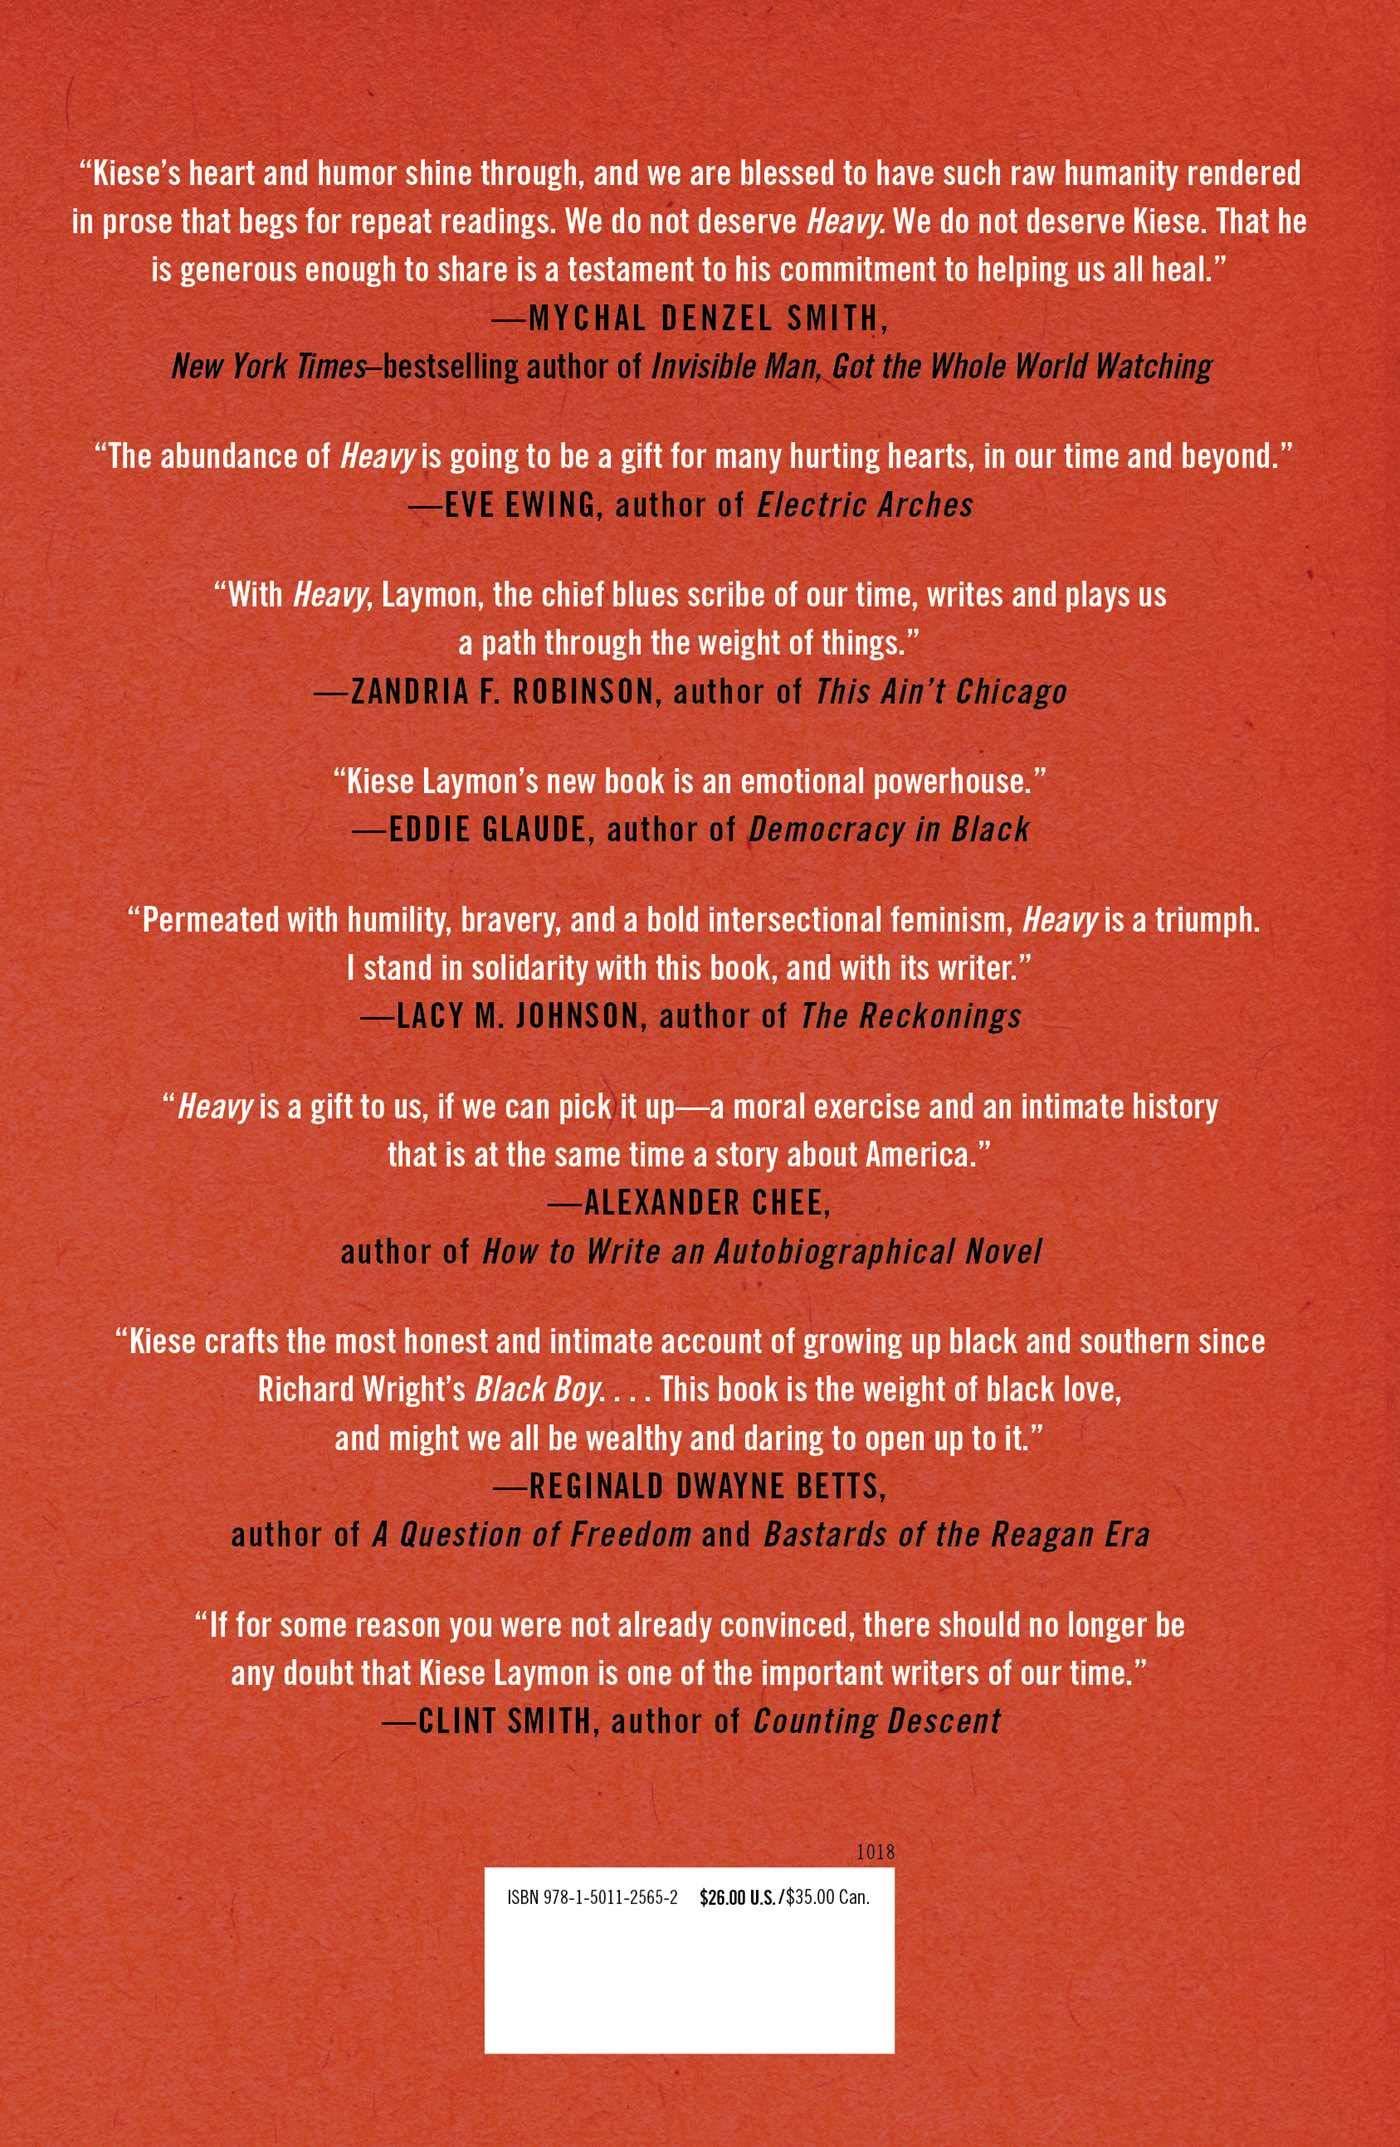 Amazon fr - Heavy: An American Memoir - Kiese Laymon - Livres